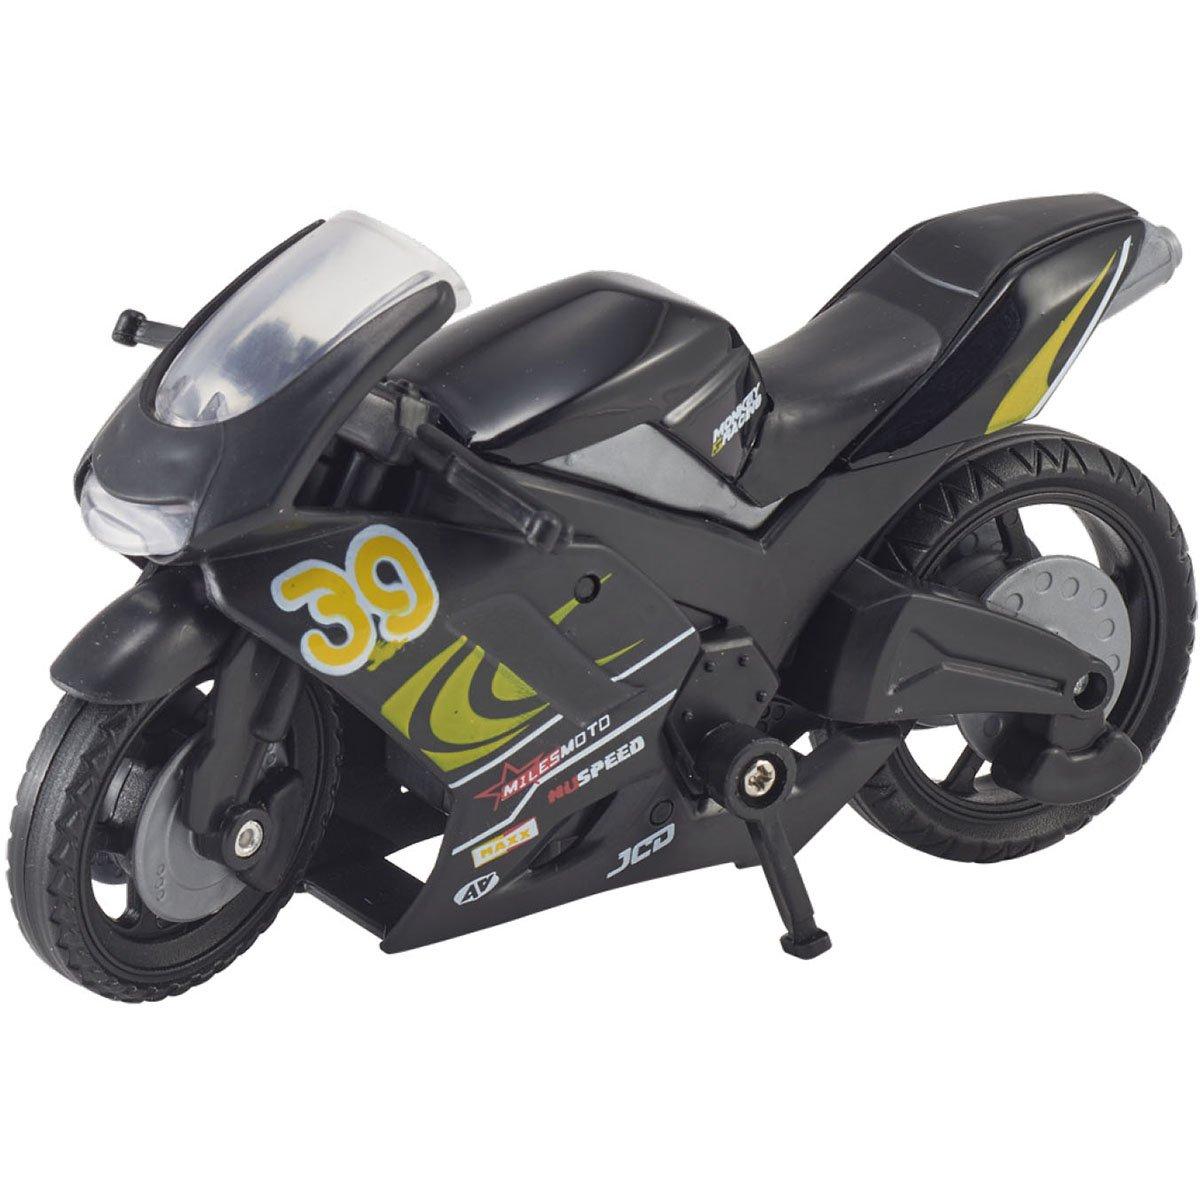 Motocicleta Teamsterz Speed Bike, Negru